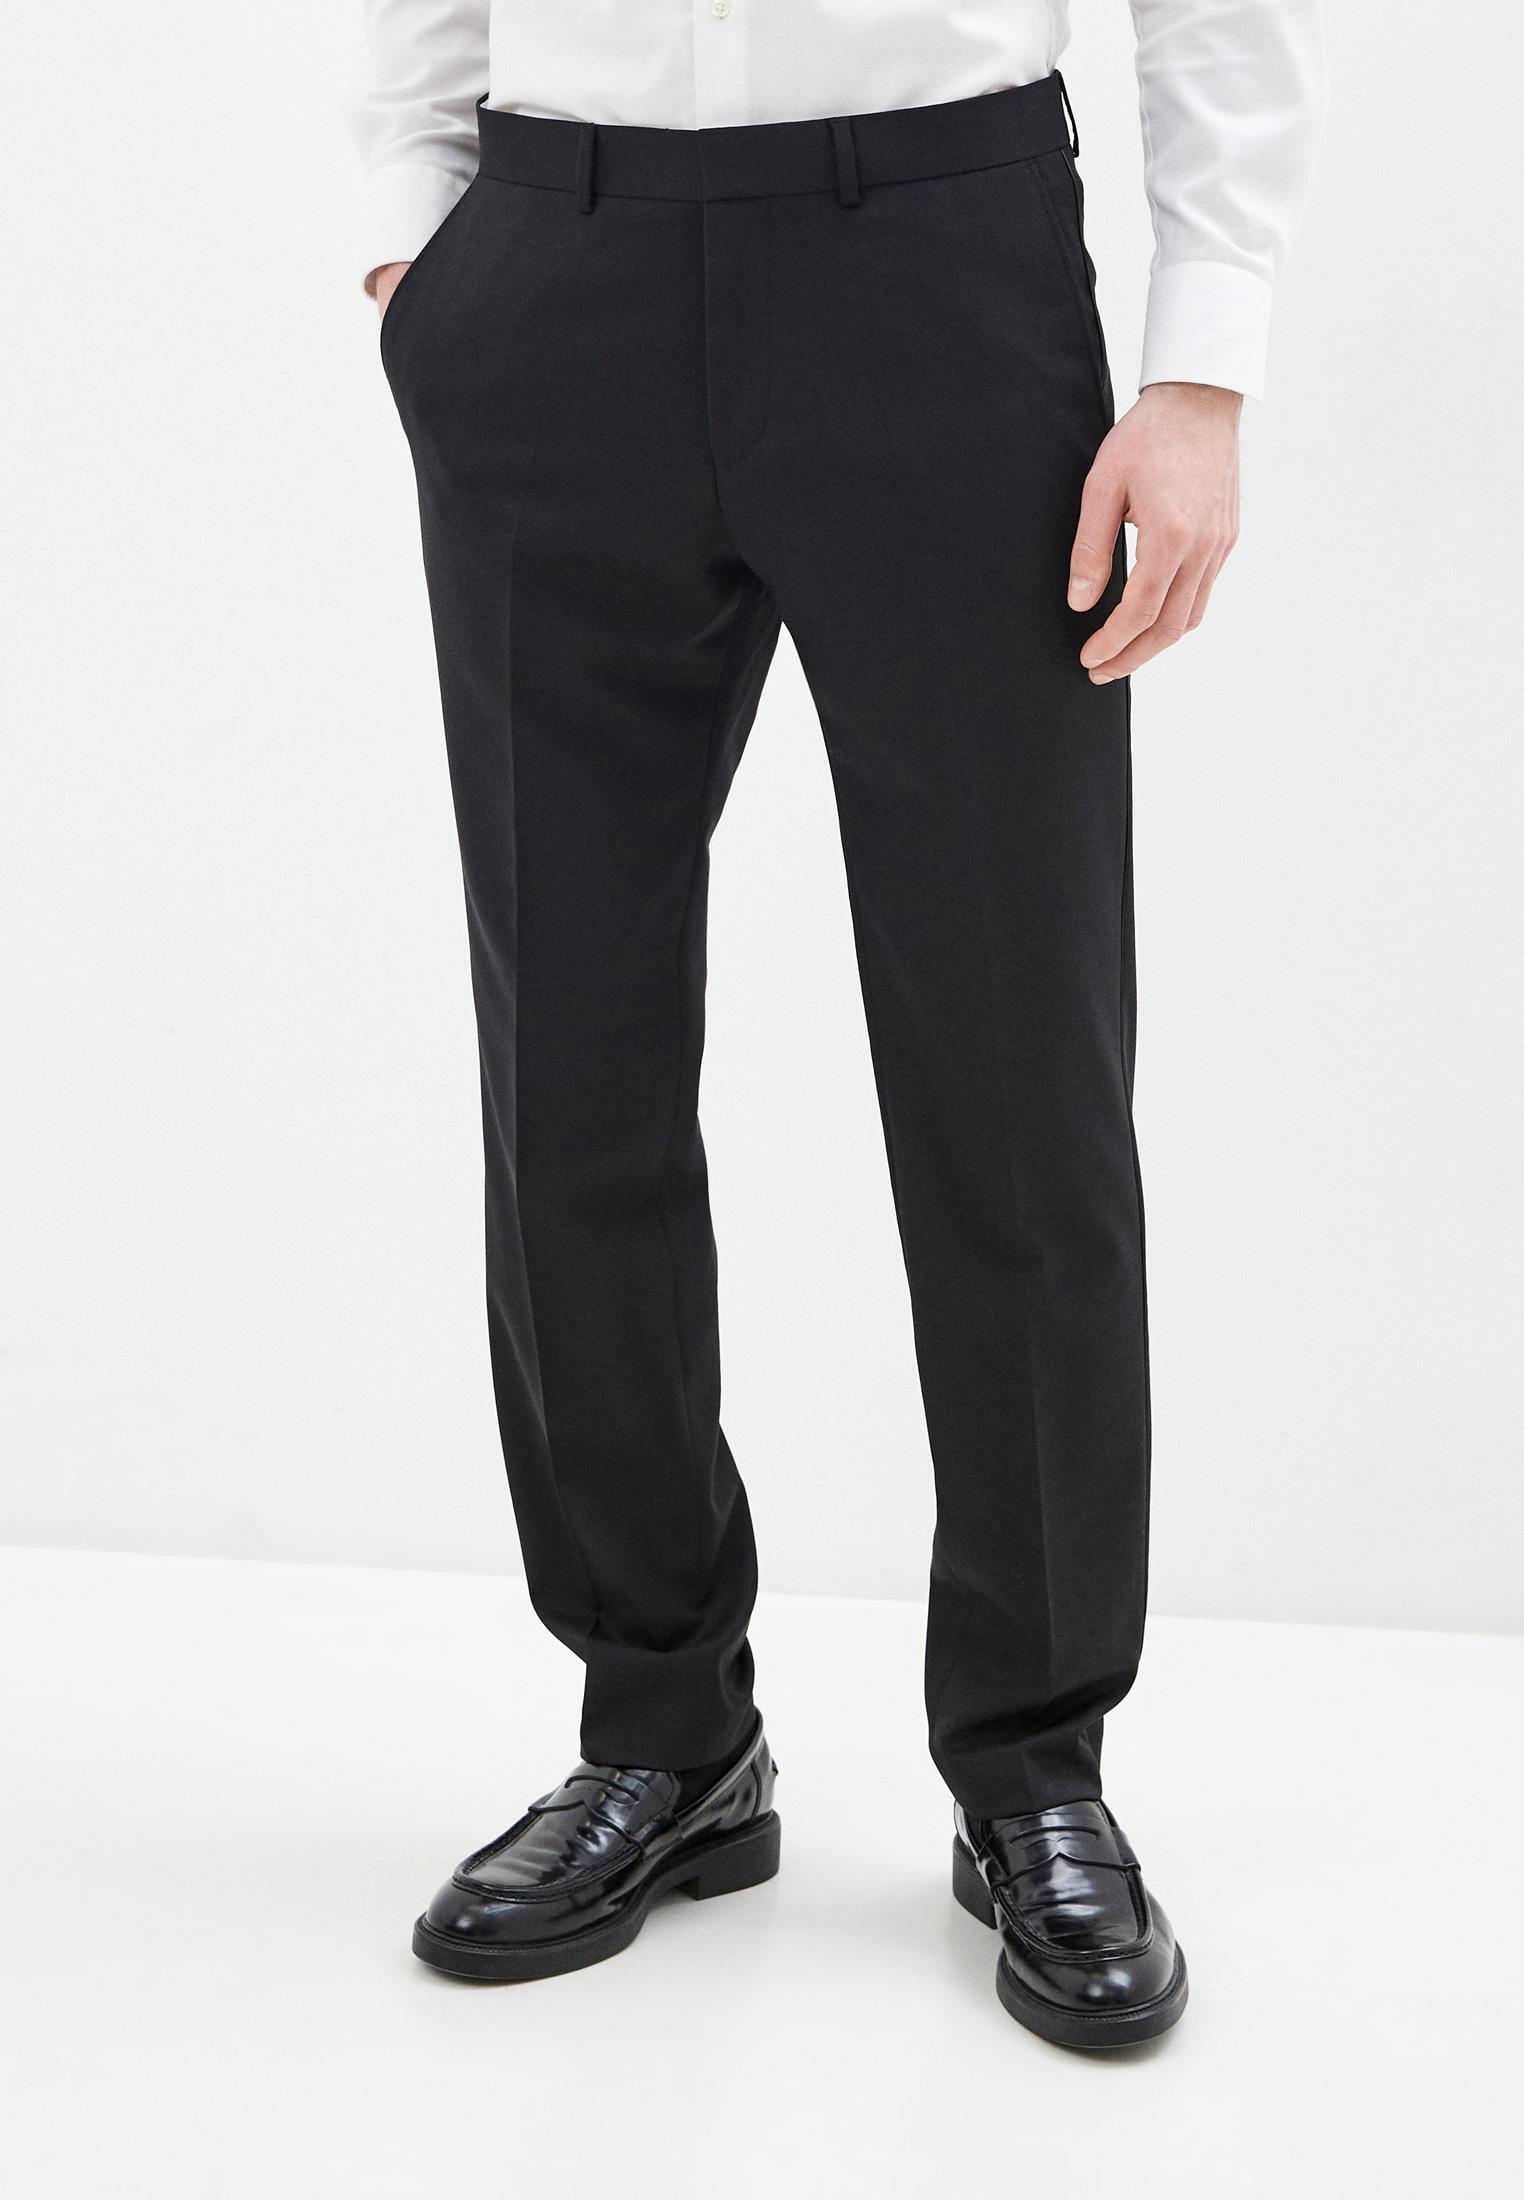 Мужские классические брюки s.Oliver Black Label 160.12.004.18.180.2037240